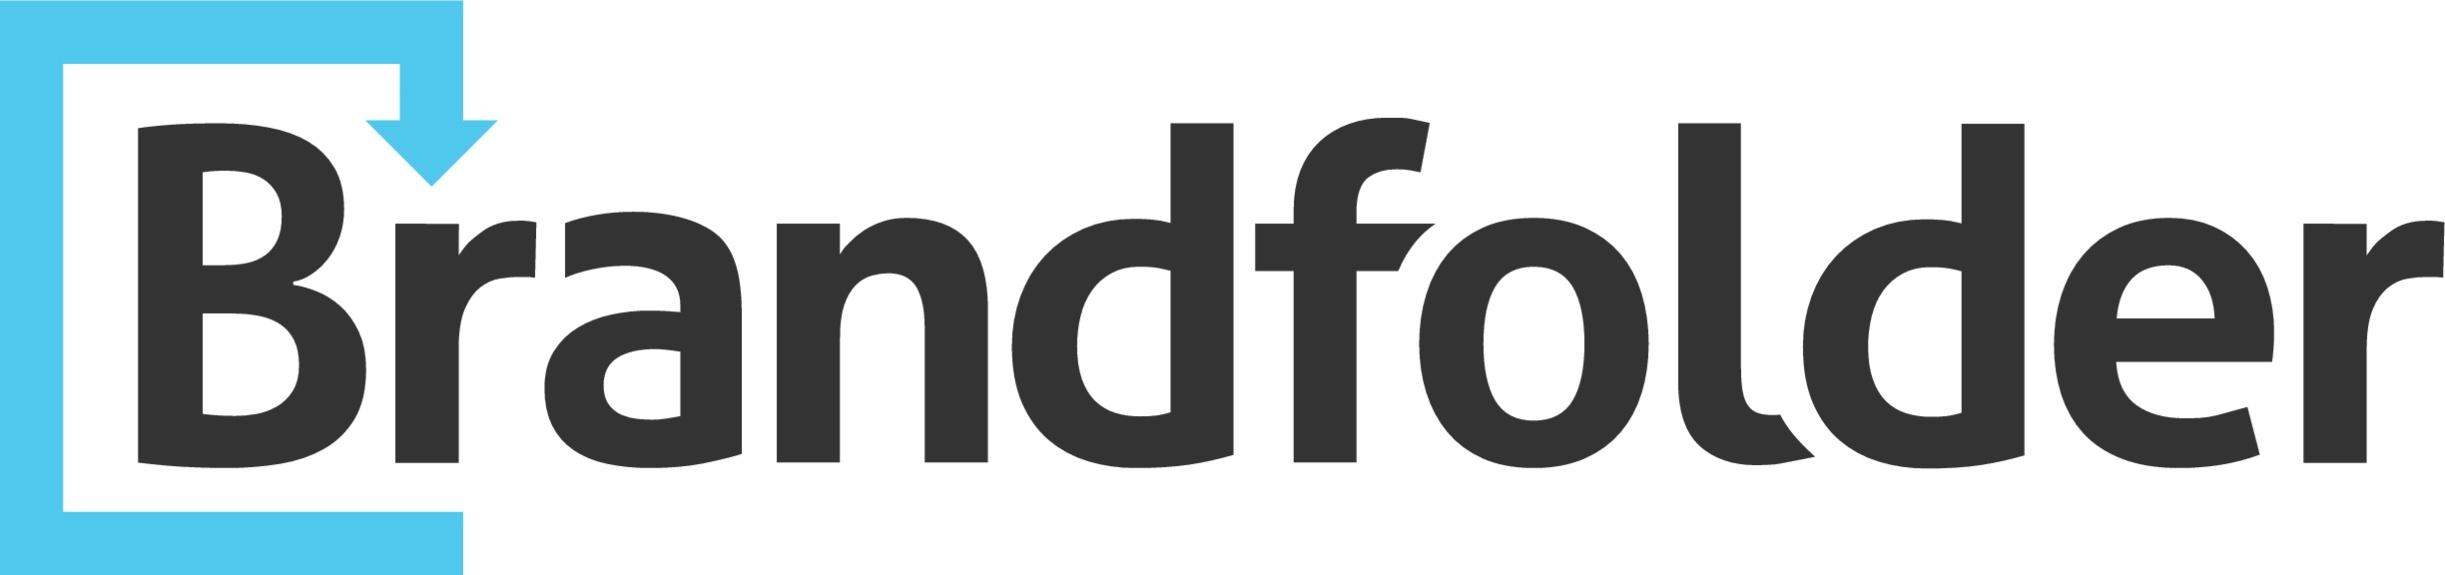 brandfolder typeface rgb-2448x575 (1)